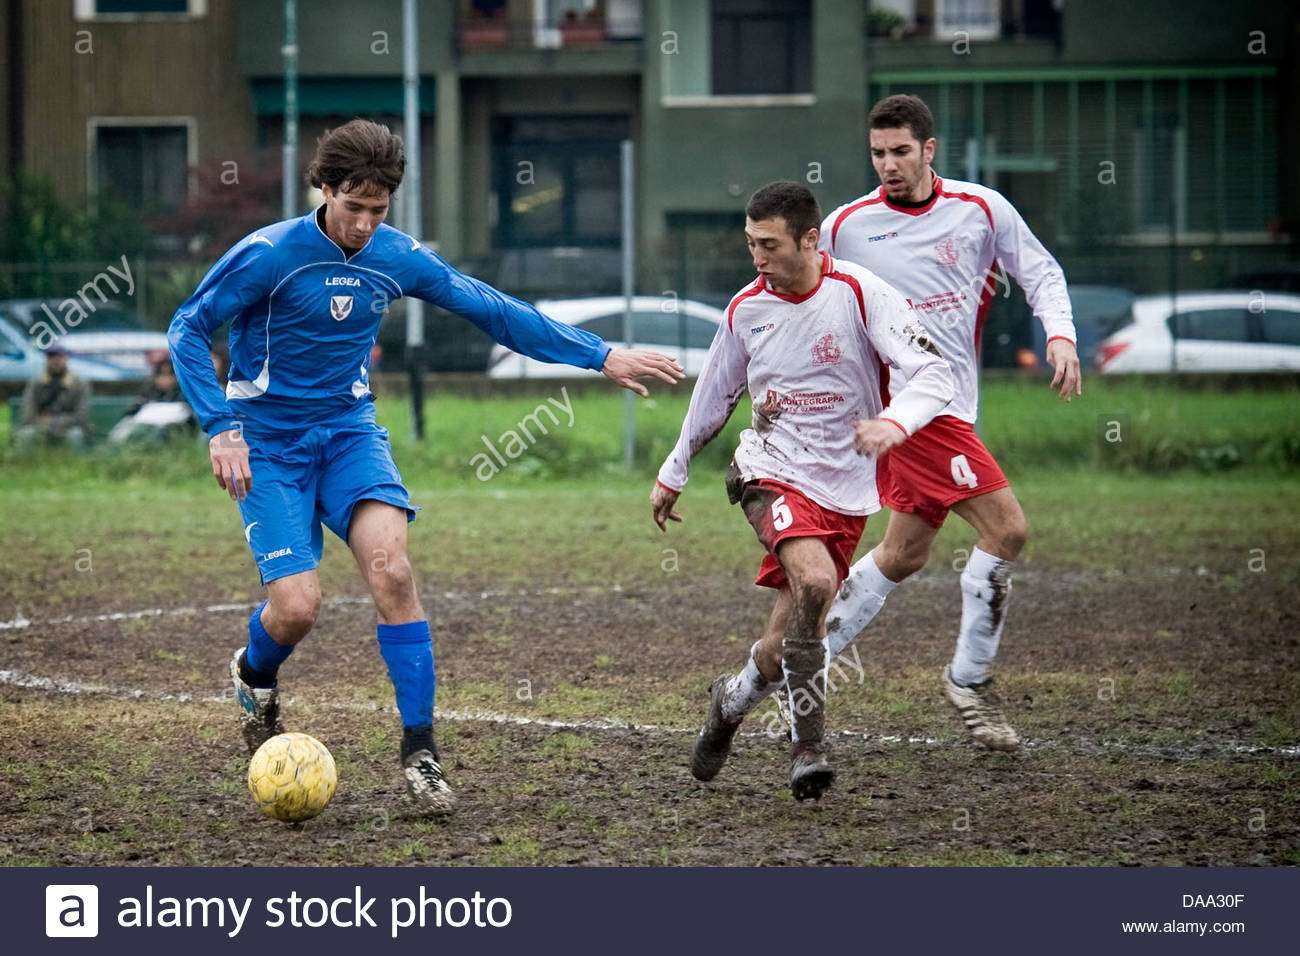 soccer match - Stock Image